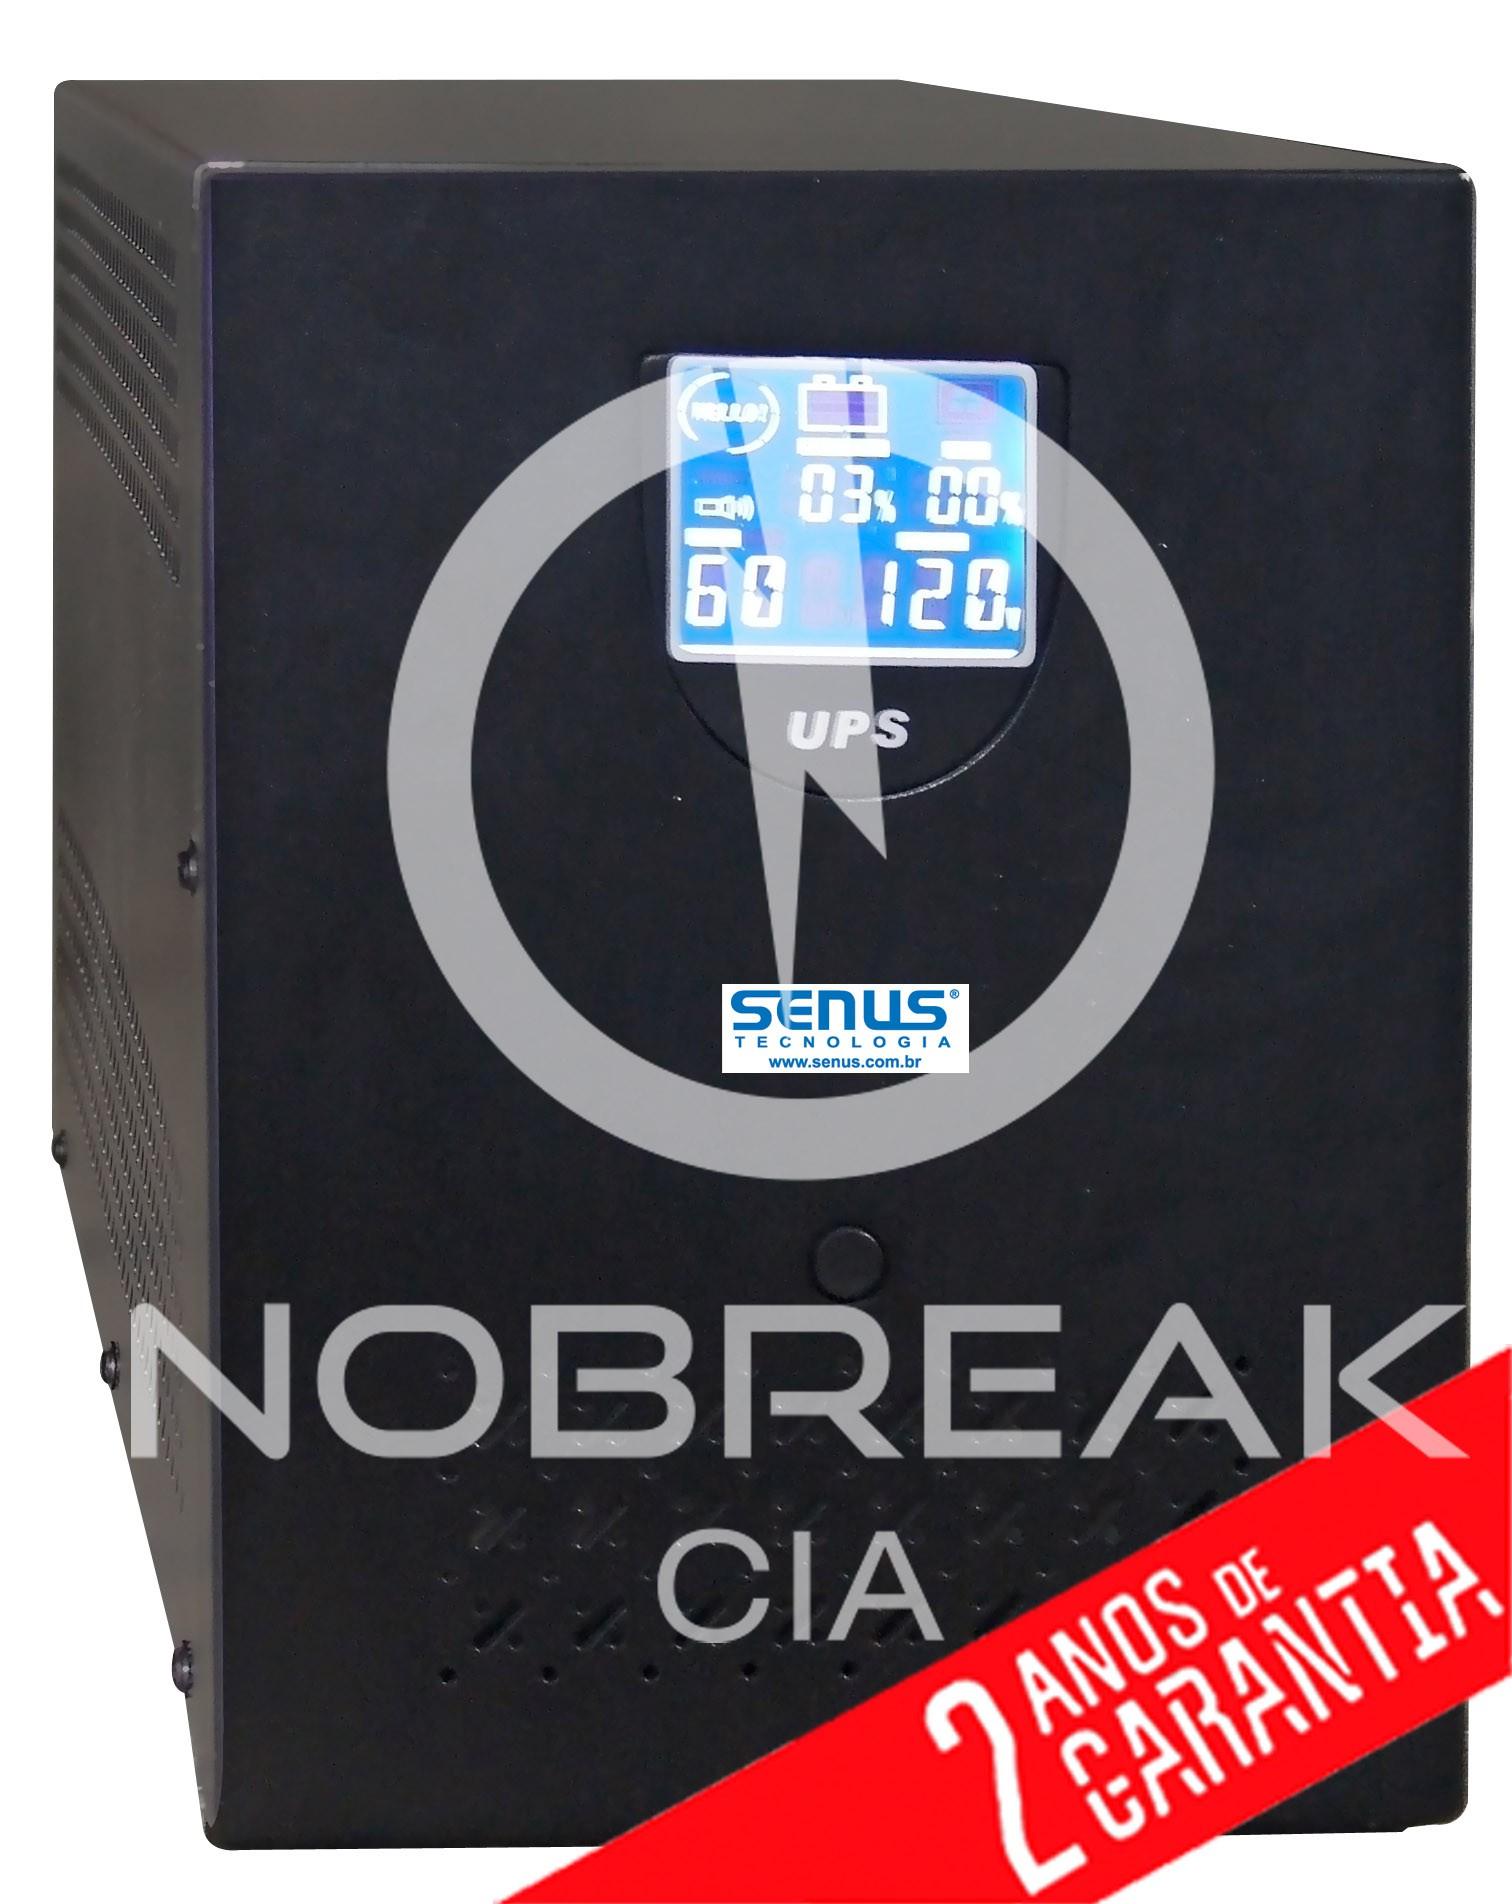 Nobreak AVR 1800 VA Senus